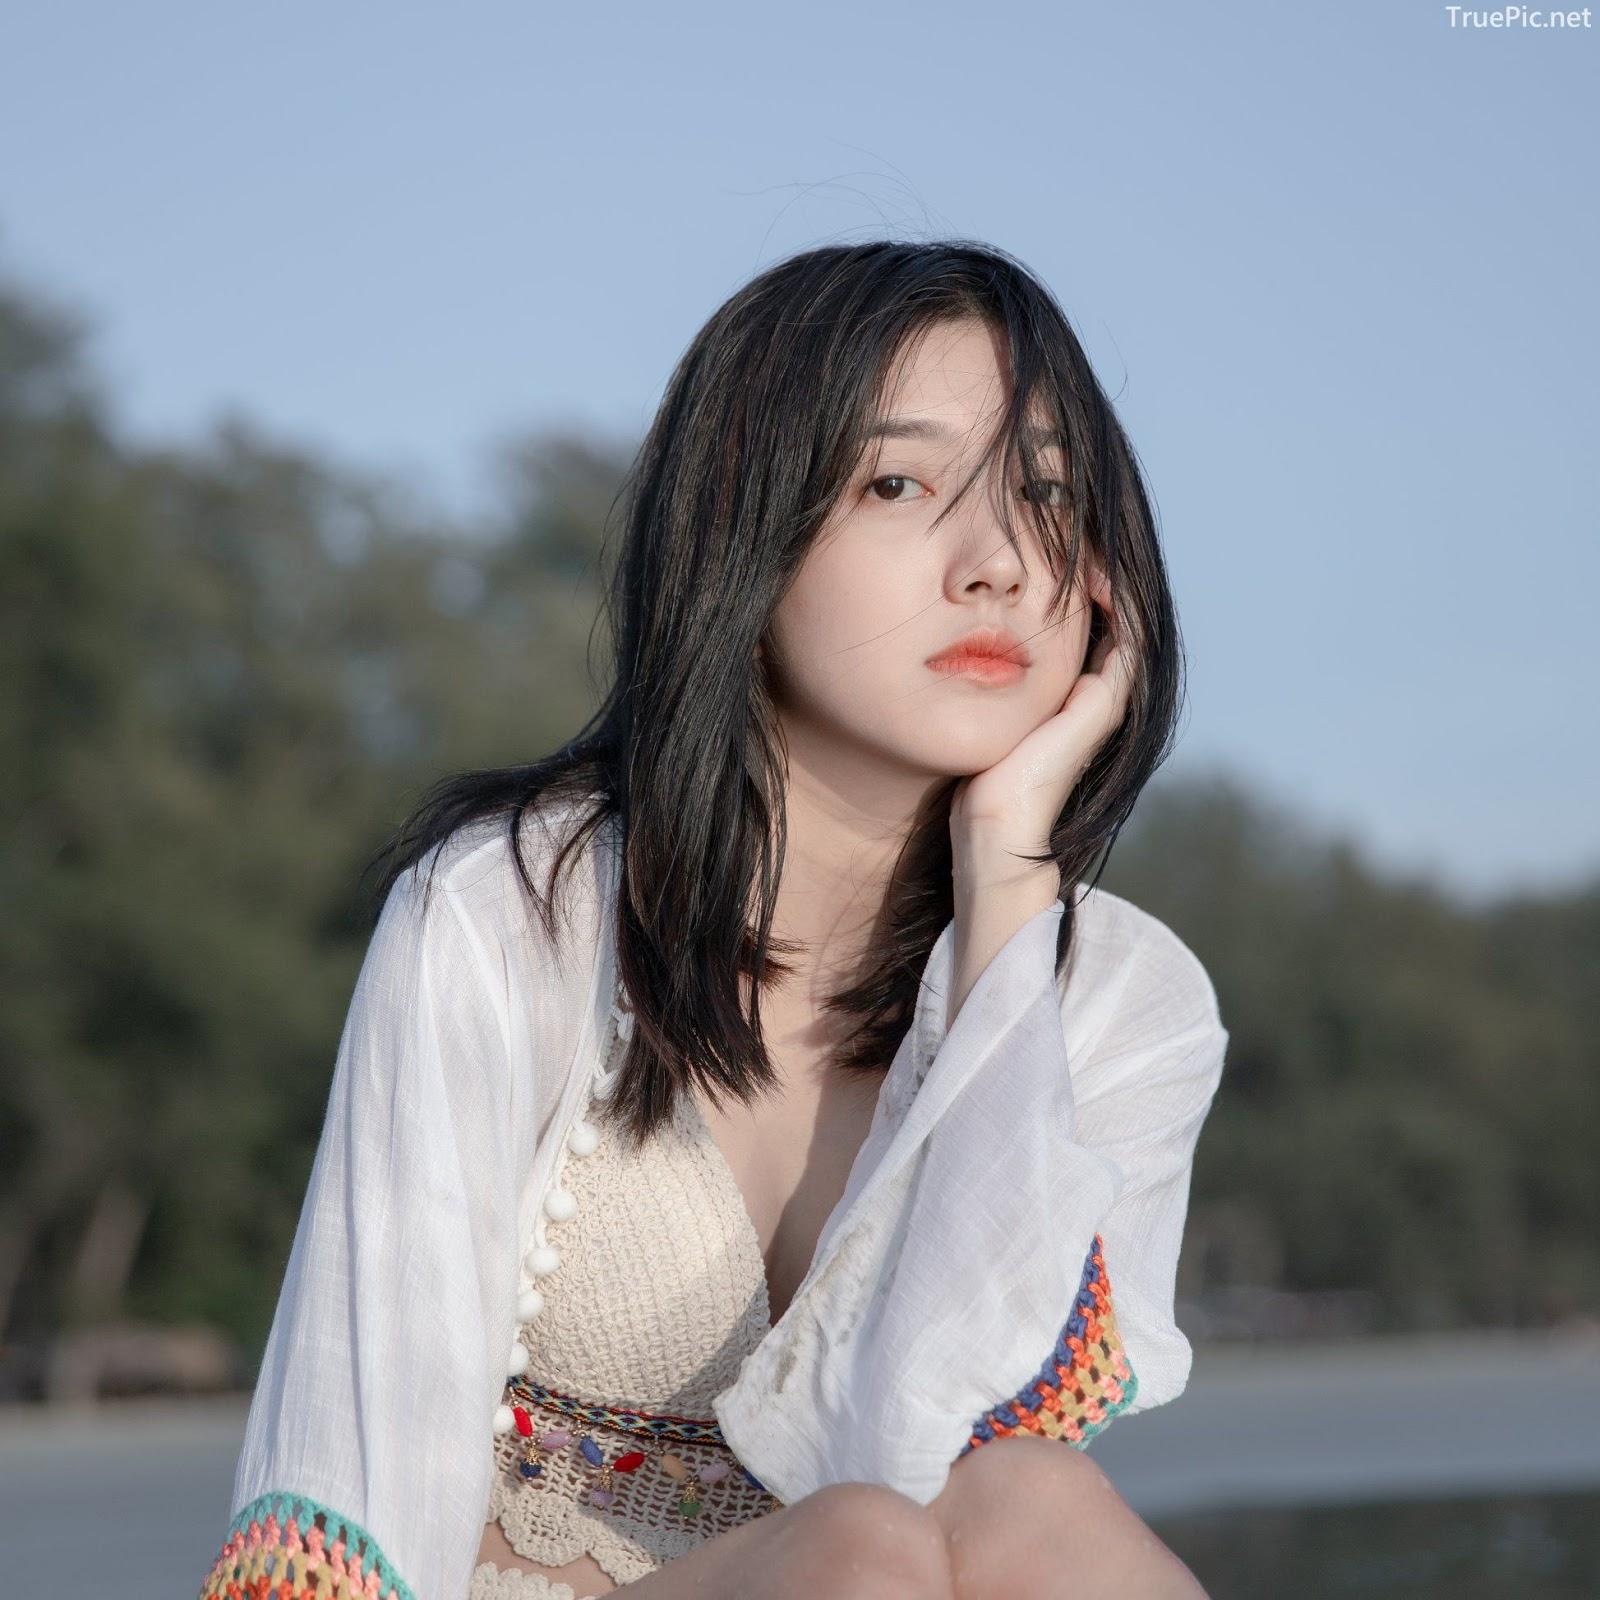 Thailand hot girl Purewarin Kosiriwalanon - Pure beauty and lovely with wool bikini - Picture 8